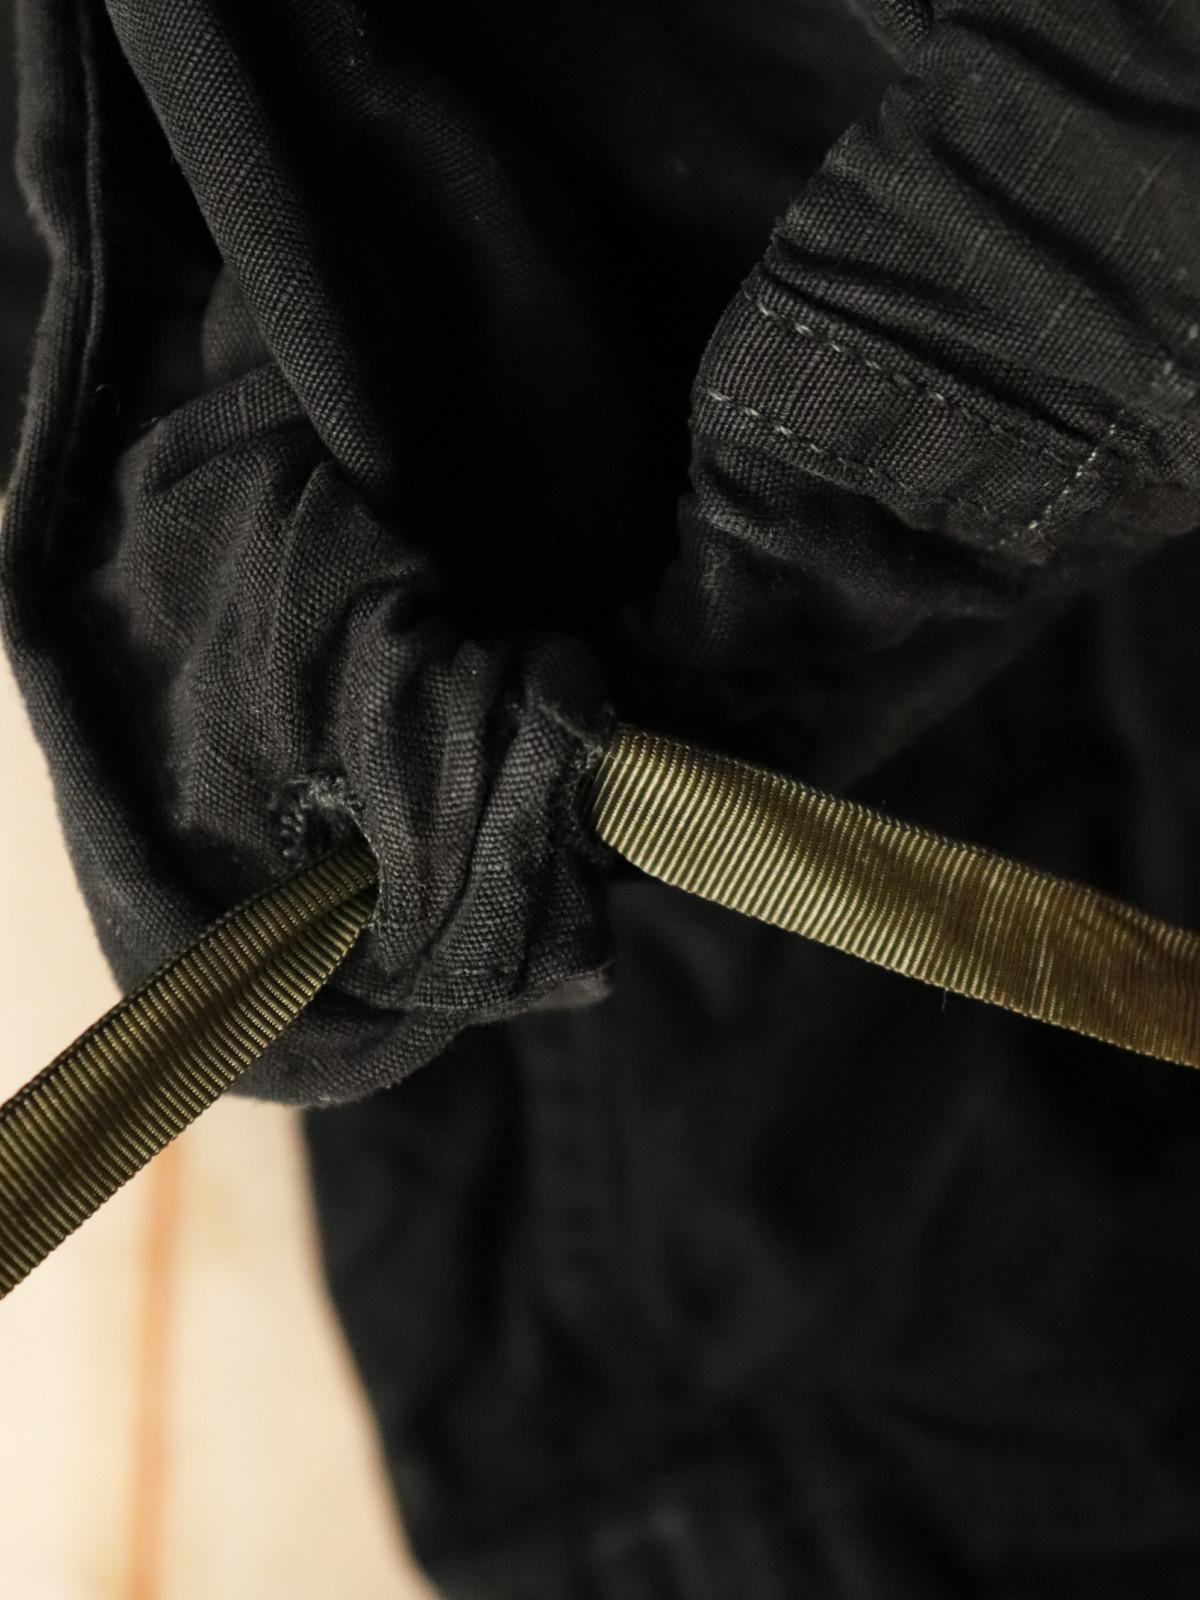 USM,cargo pants,Black-dyed ,